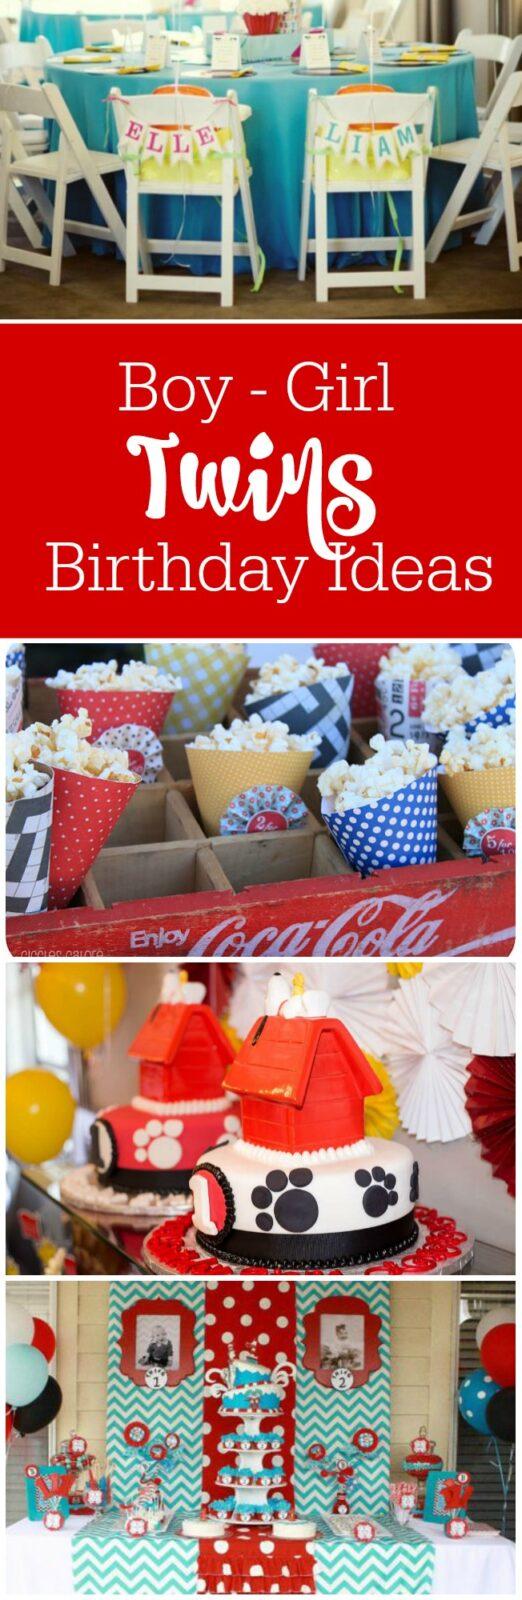 birthday party ideas for boy girl twins